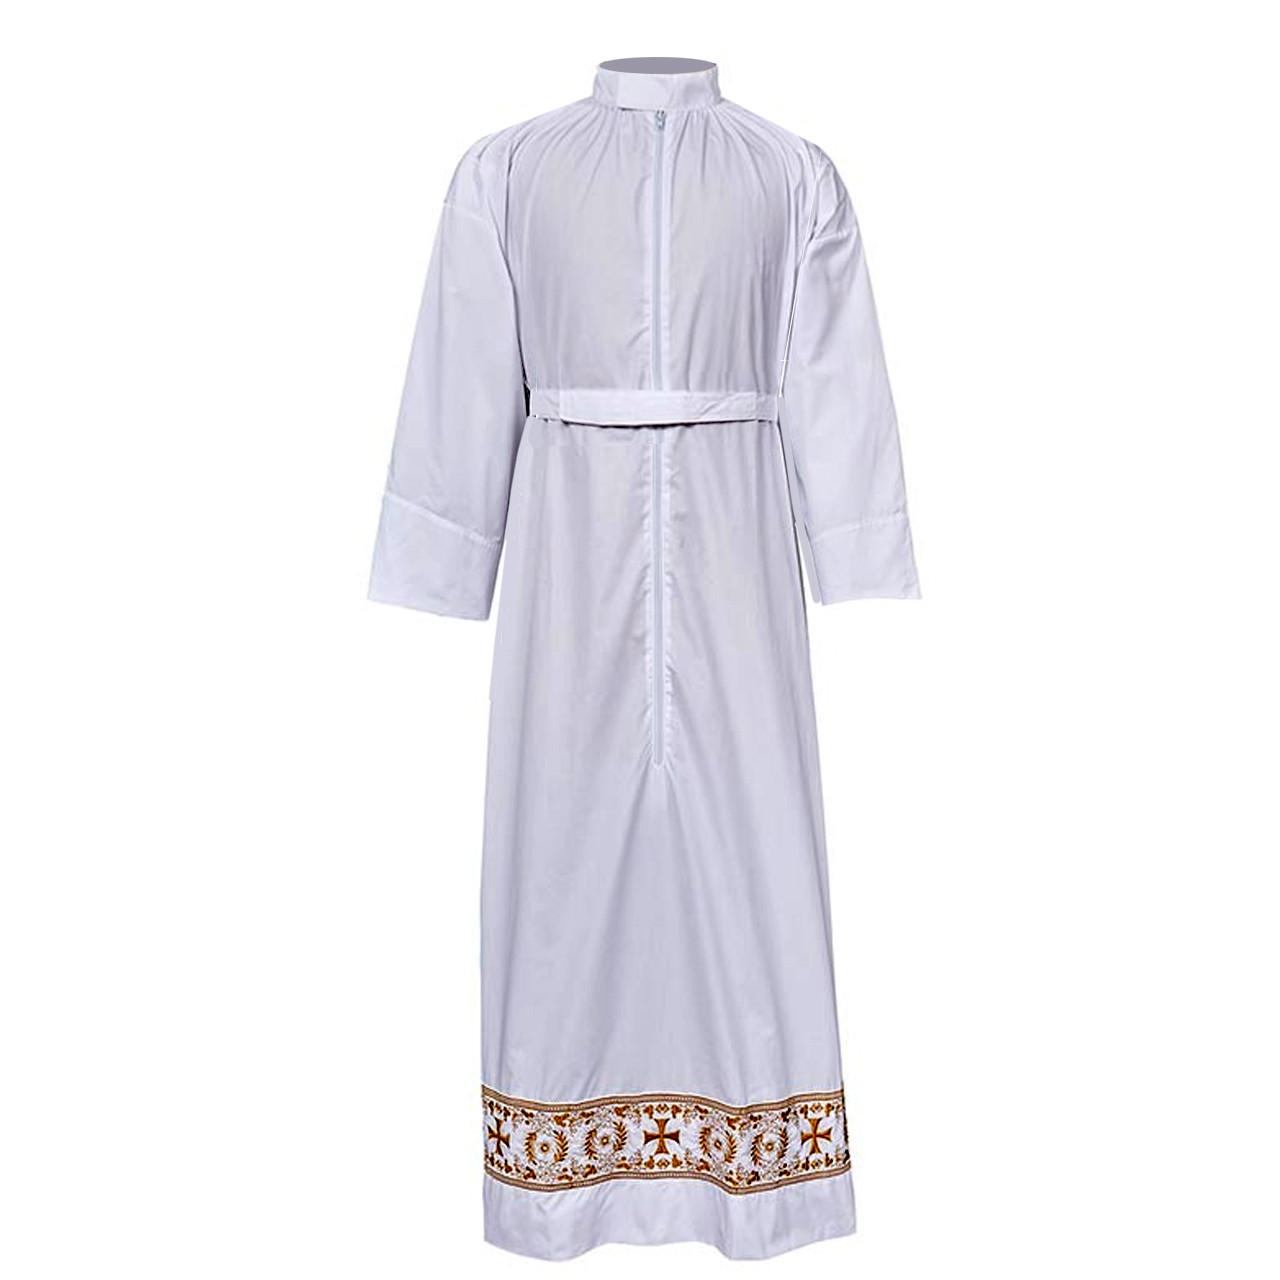 J0896 Eucharistic Self Fitting Alb